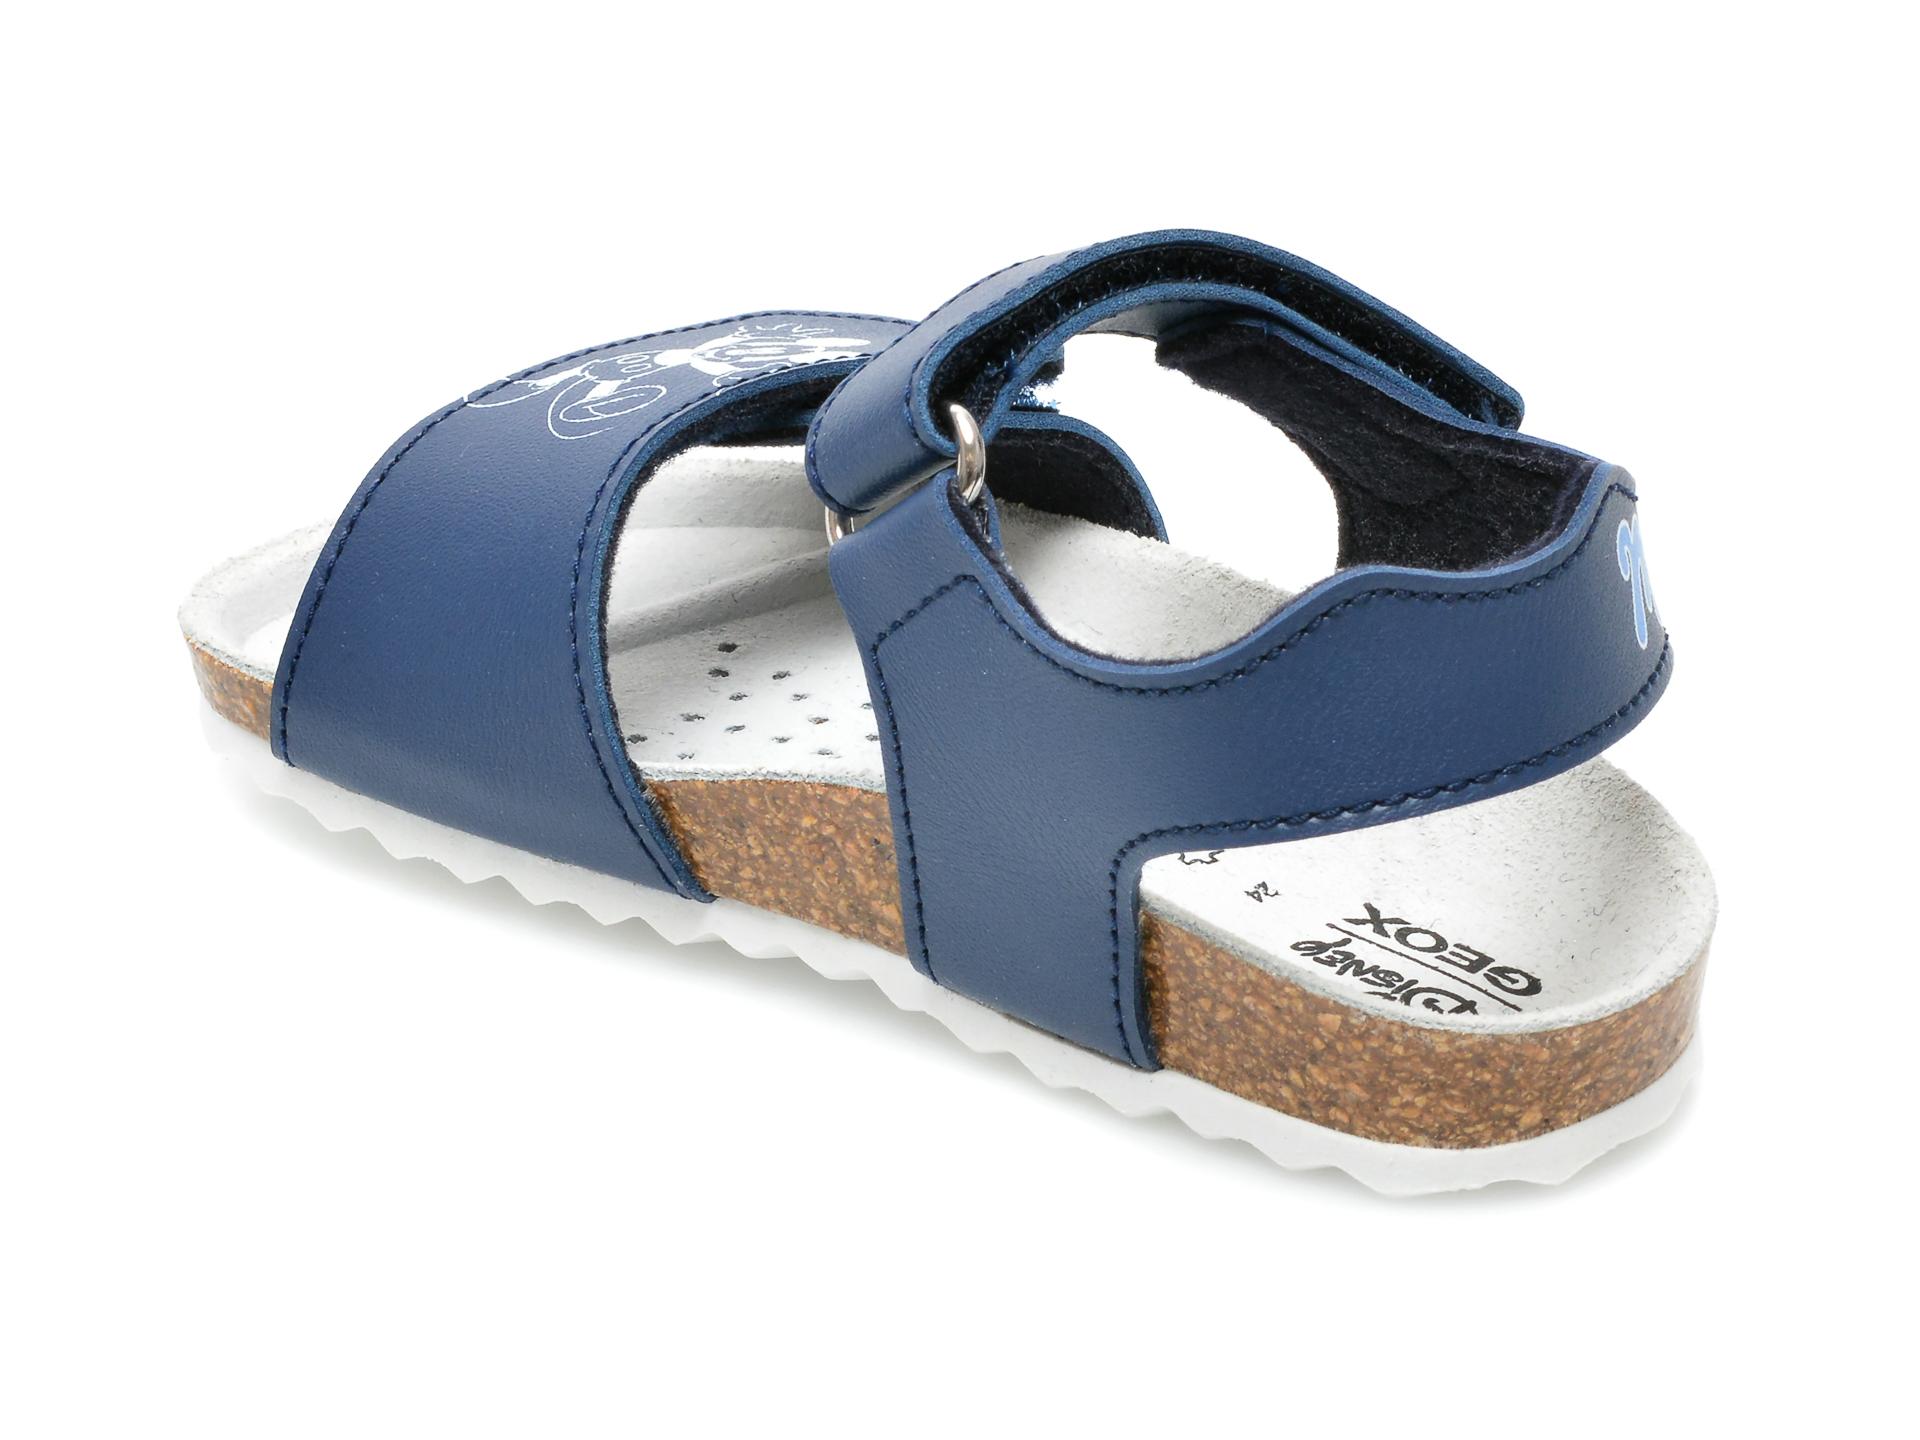 Sandale GEOX albastre, B152QC, din piele ecologica - 5